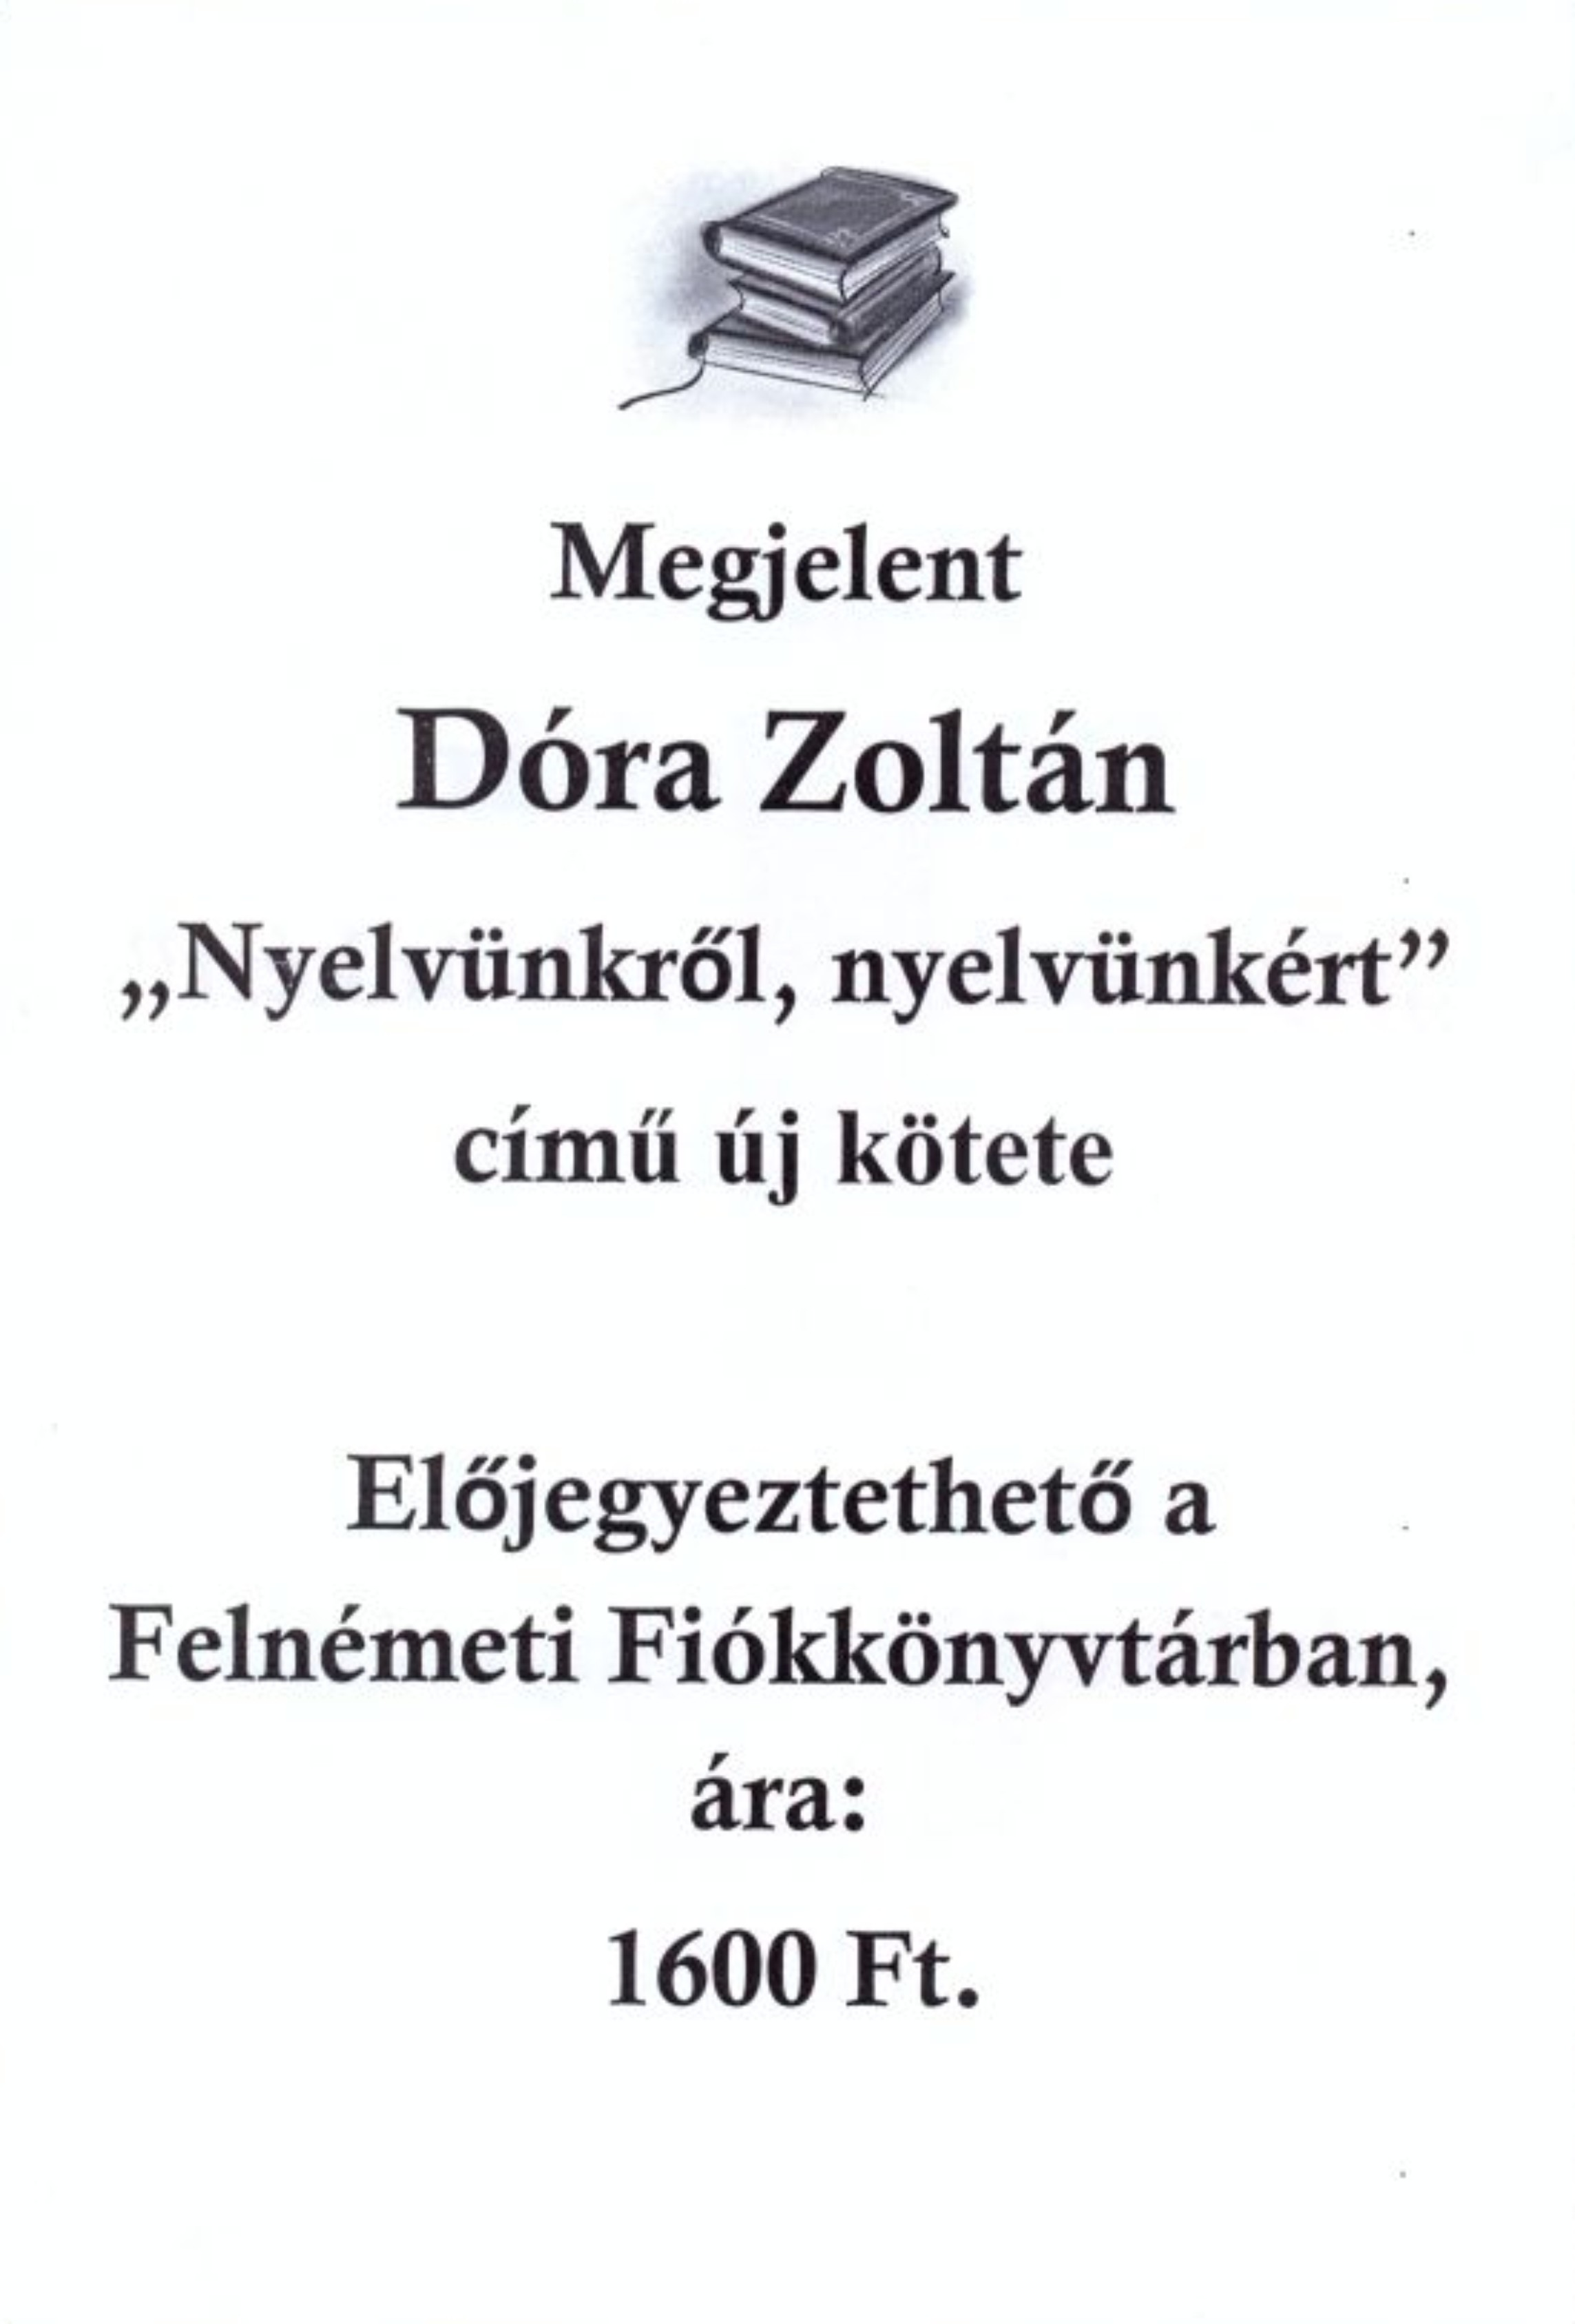 dora_zoltan_konyv.jpg